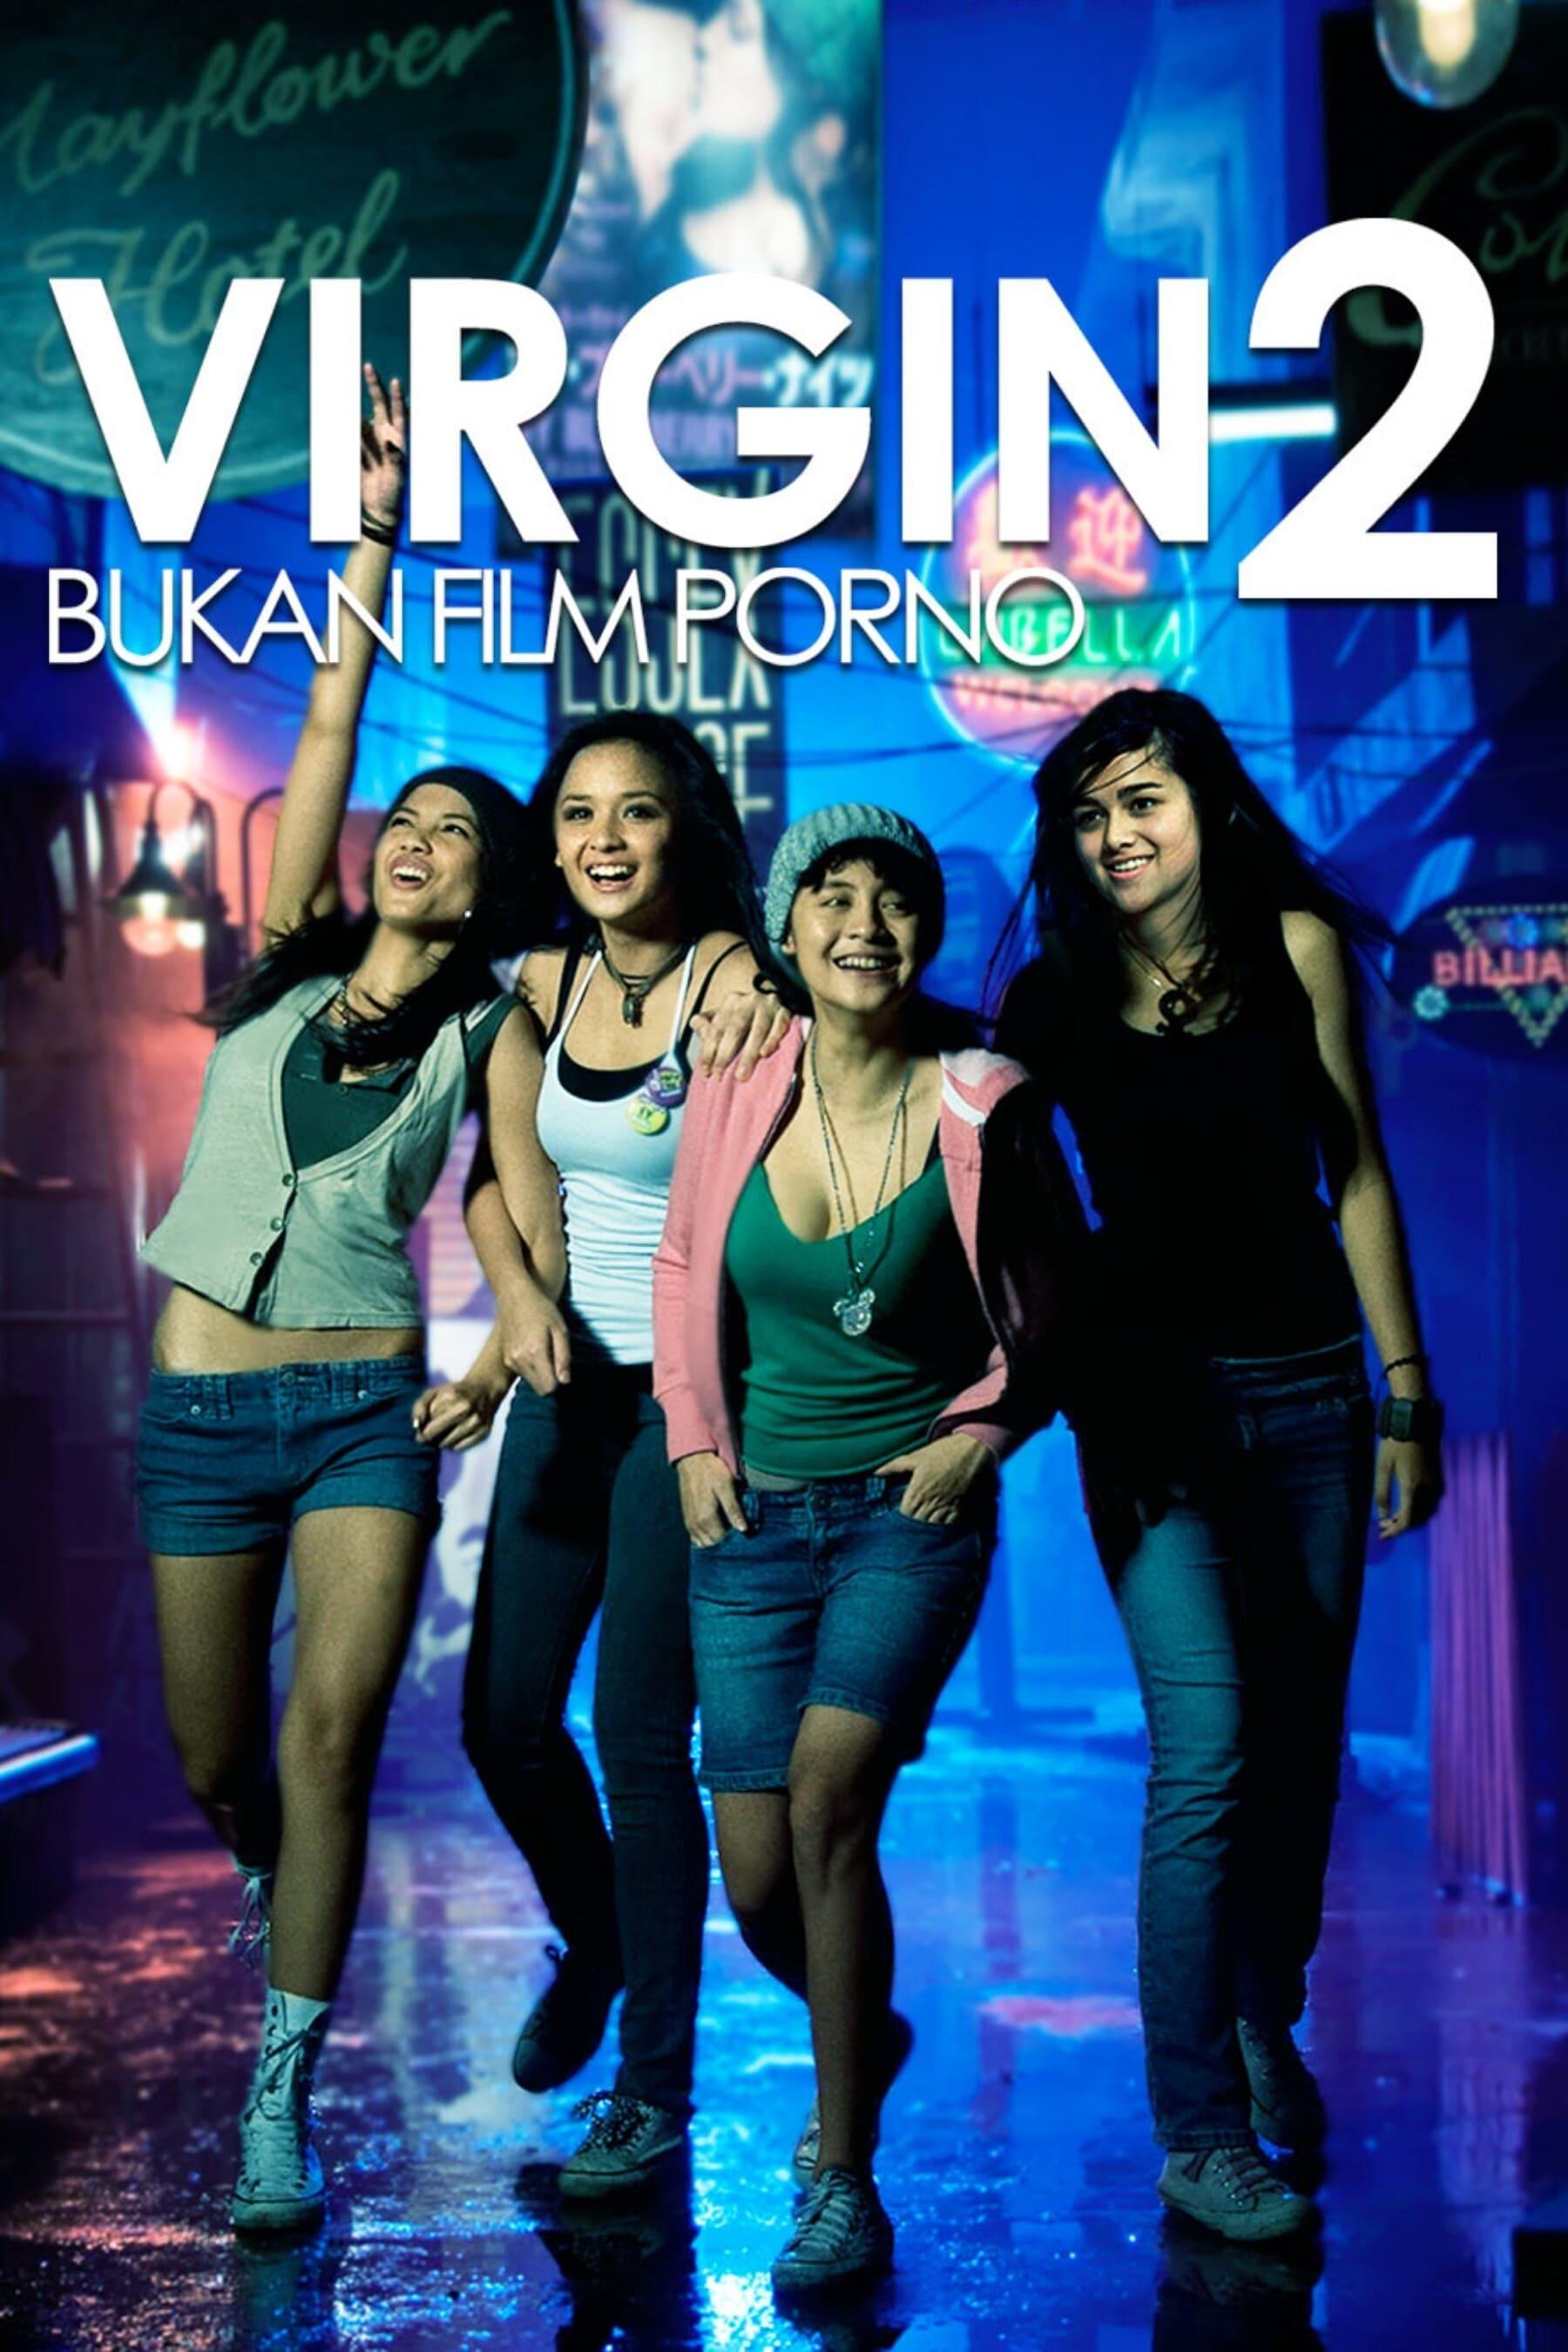 Virgin 2: Not a Porn Movie